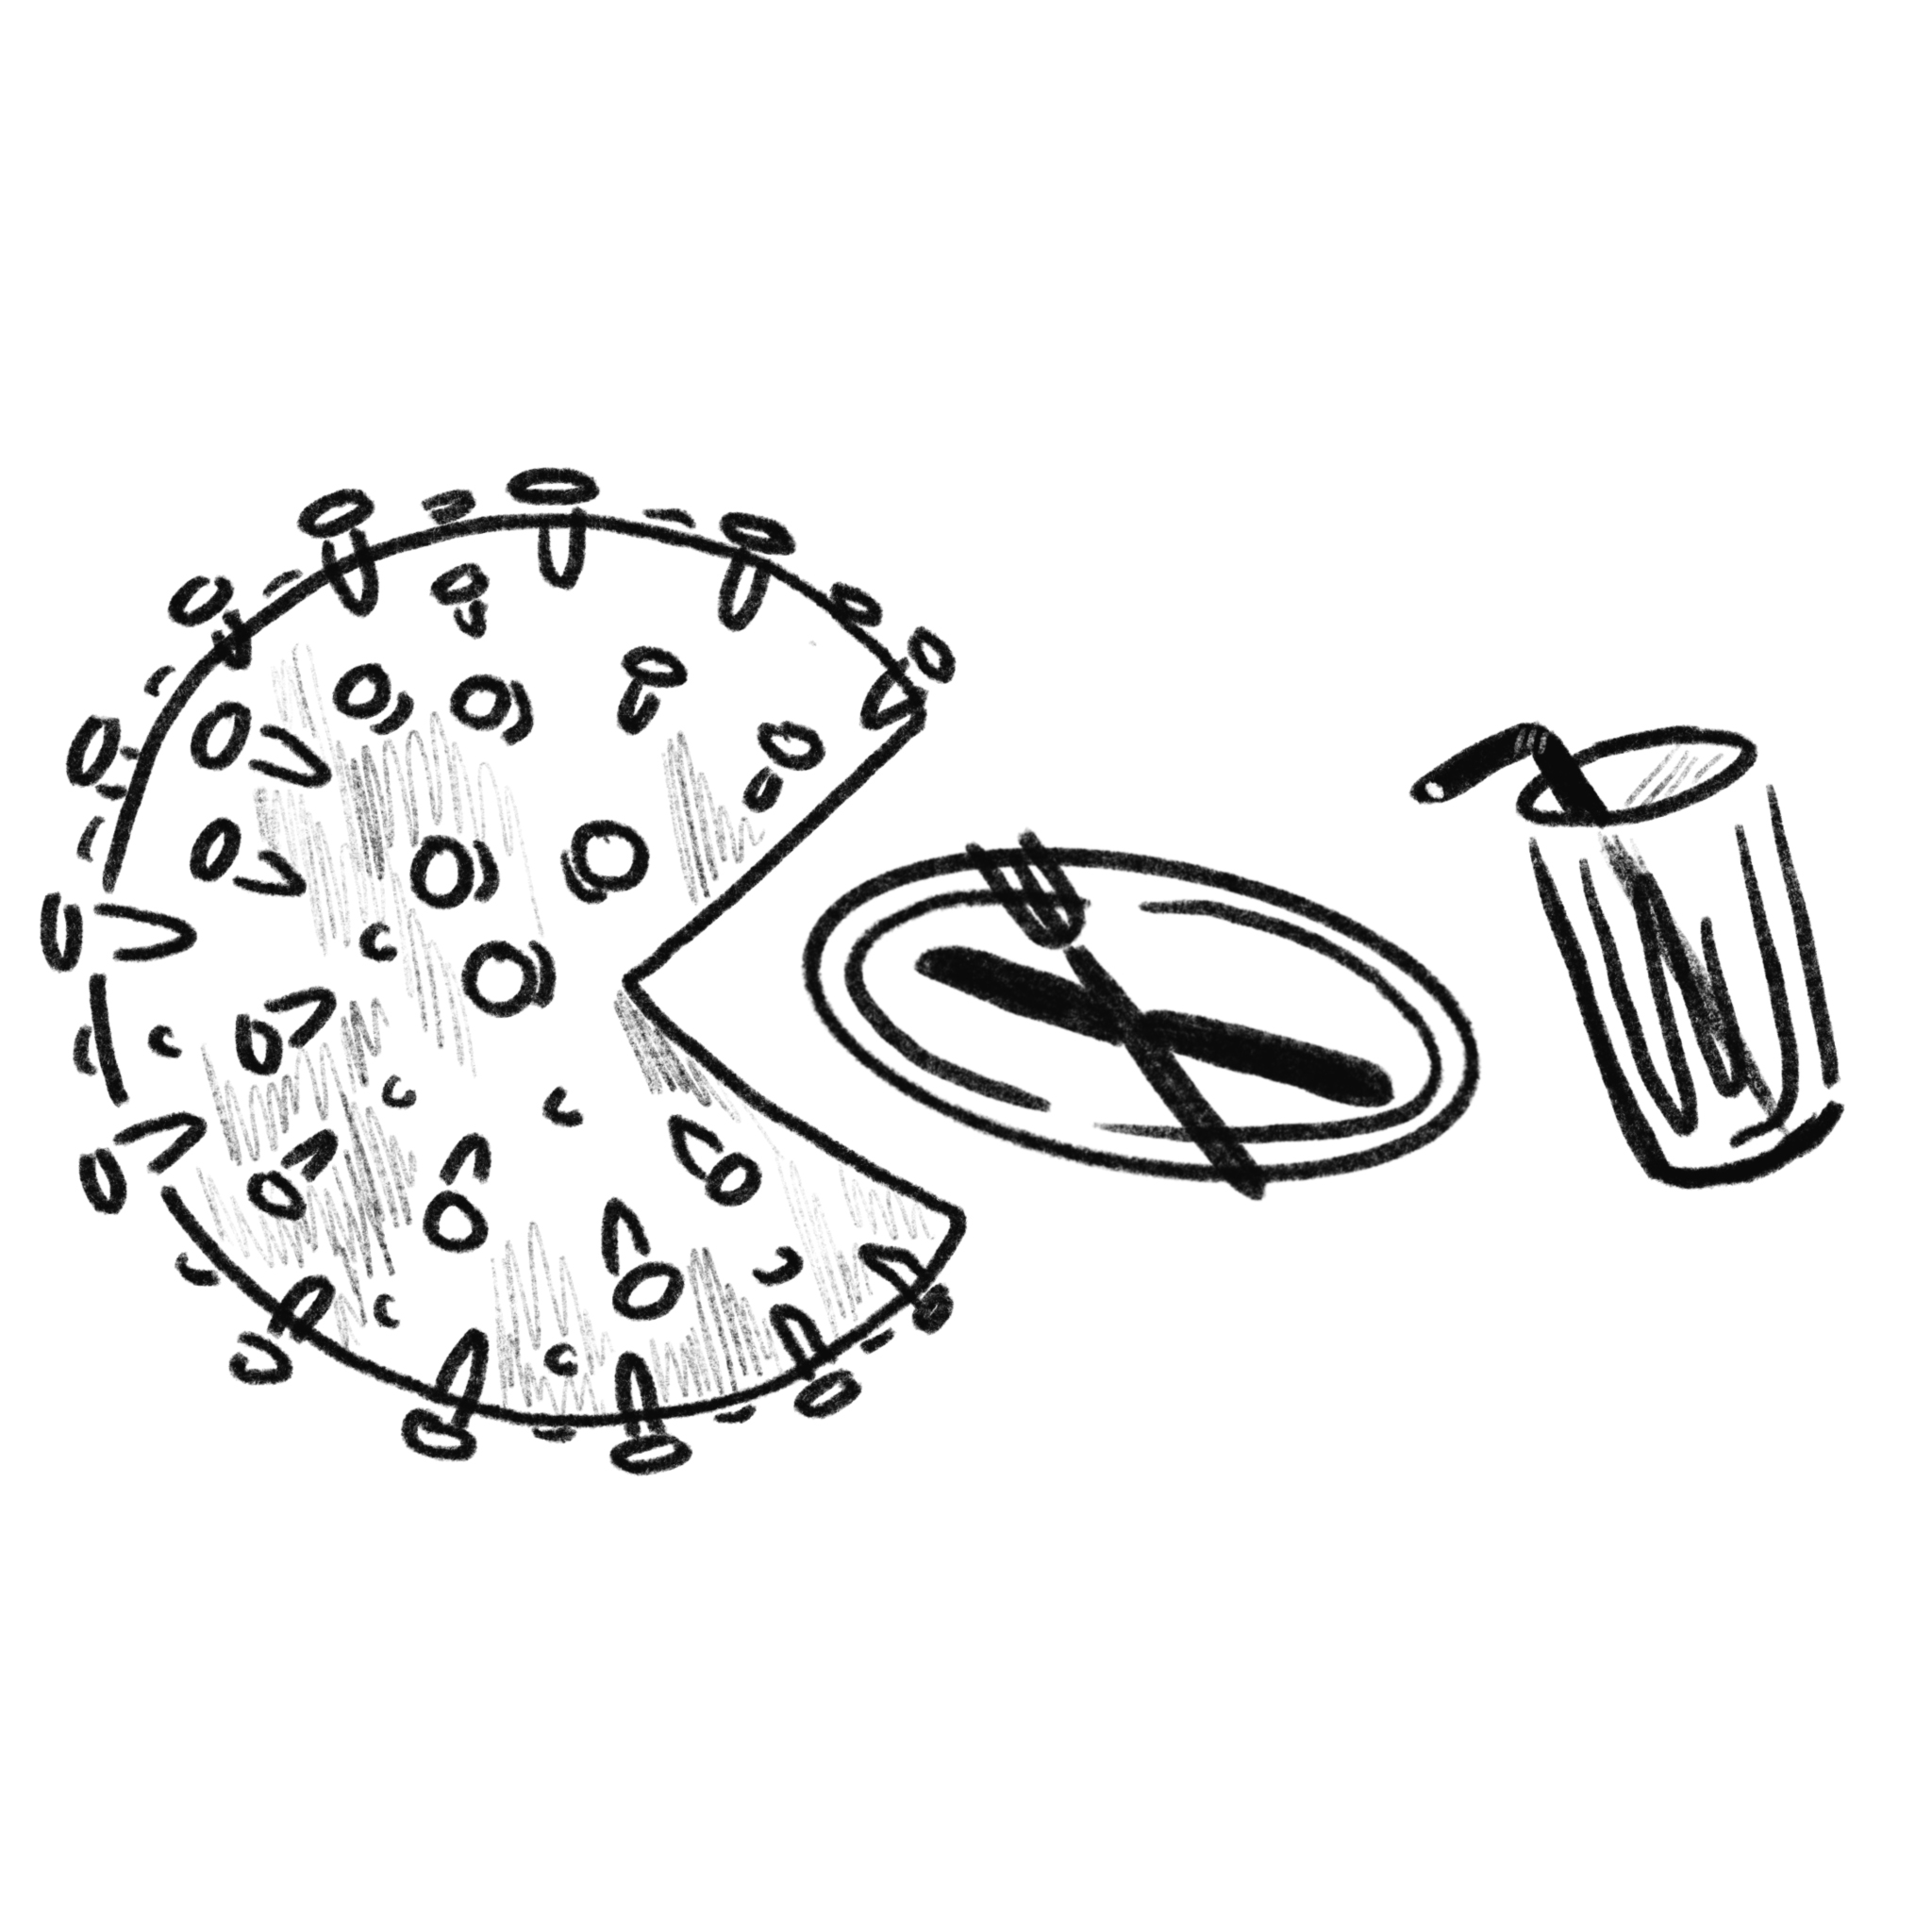 LATIMES-031920-spots_2-corona2-PACMAN